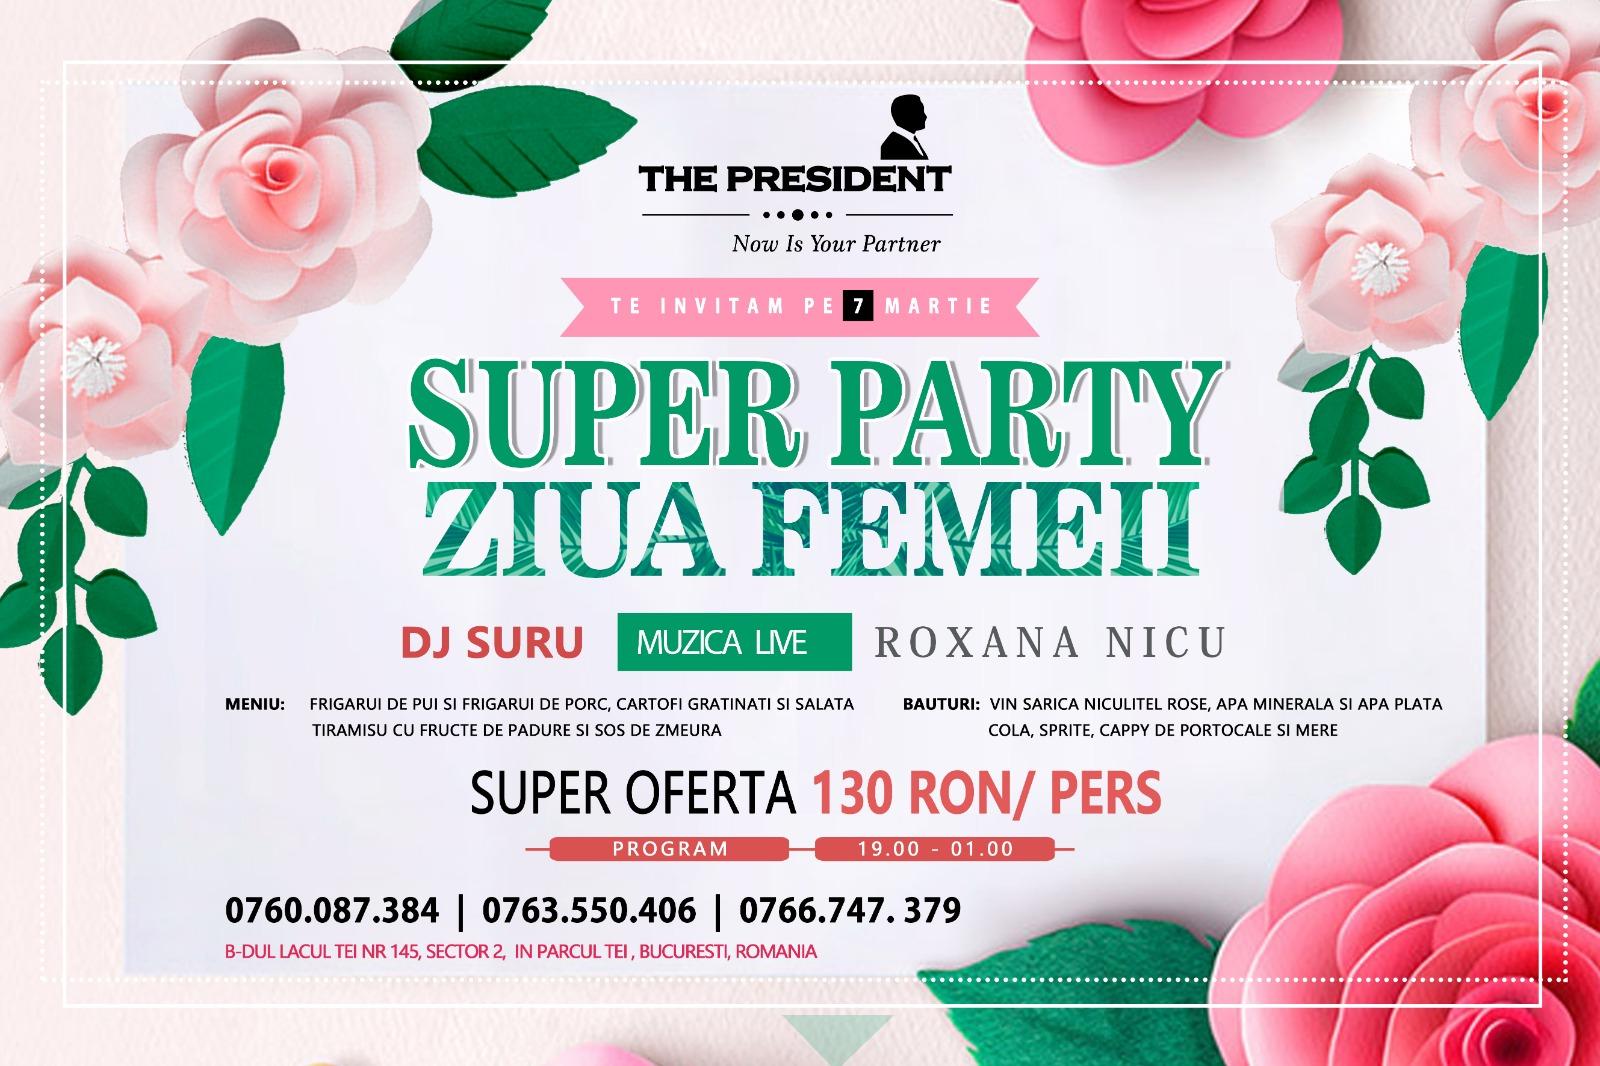 Super Party la The President2